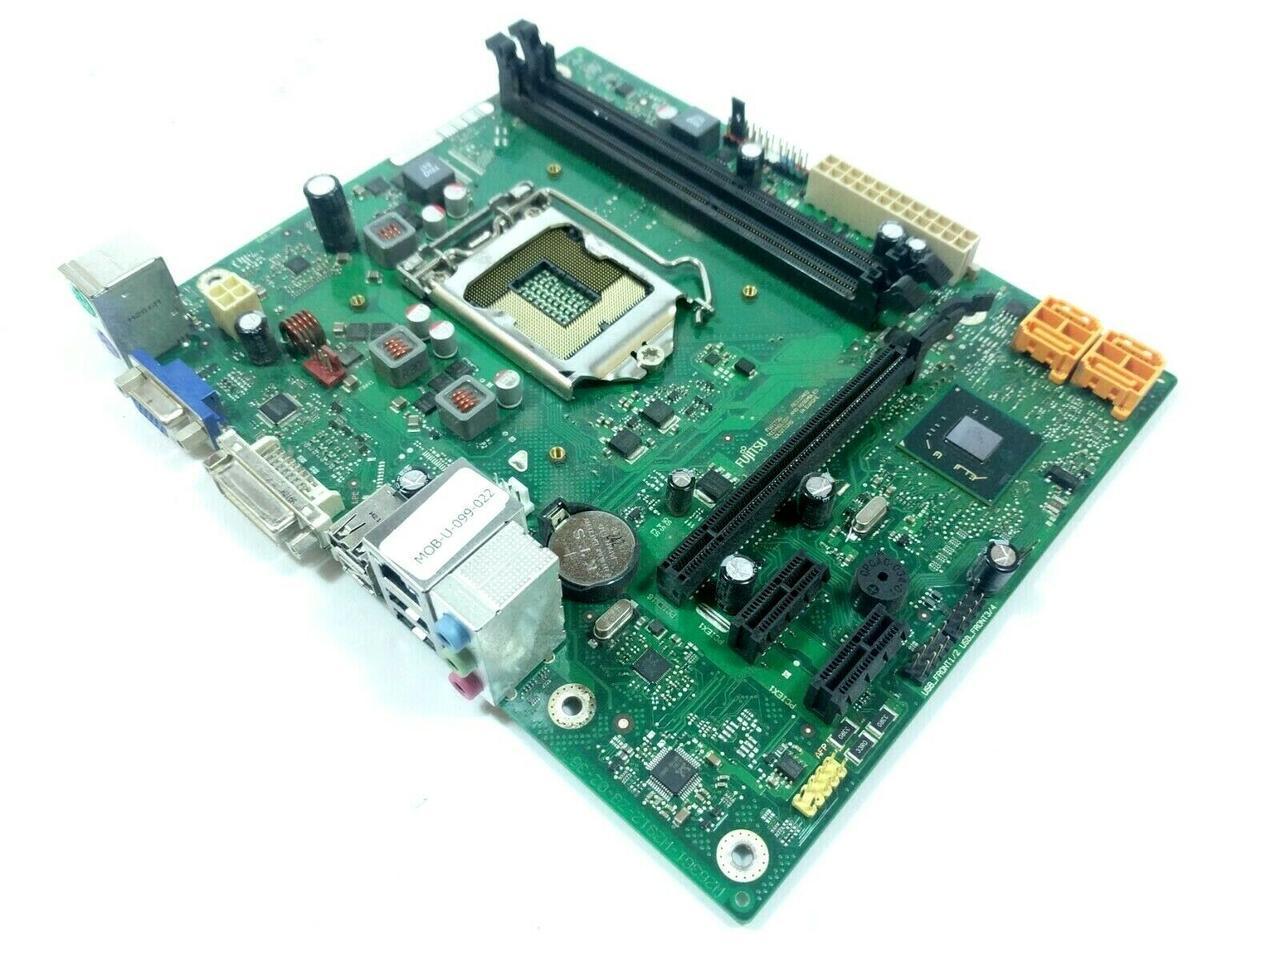 БРЭНДОВАЯ НАДЕЖНАЯ ПЛАТА LGA1155  Fujitsu D2990-A21 H61/DDR3 Поддерживает Core- i7,i5, i3  3го ПОКОЛЕНИЯ s1155